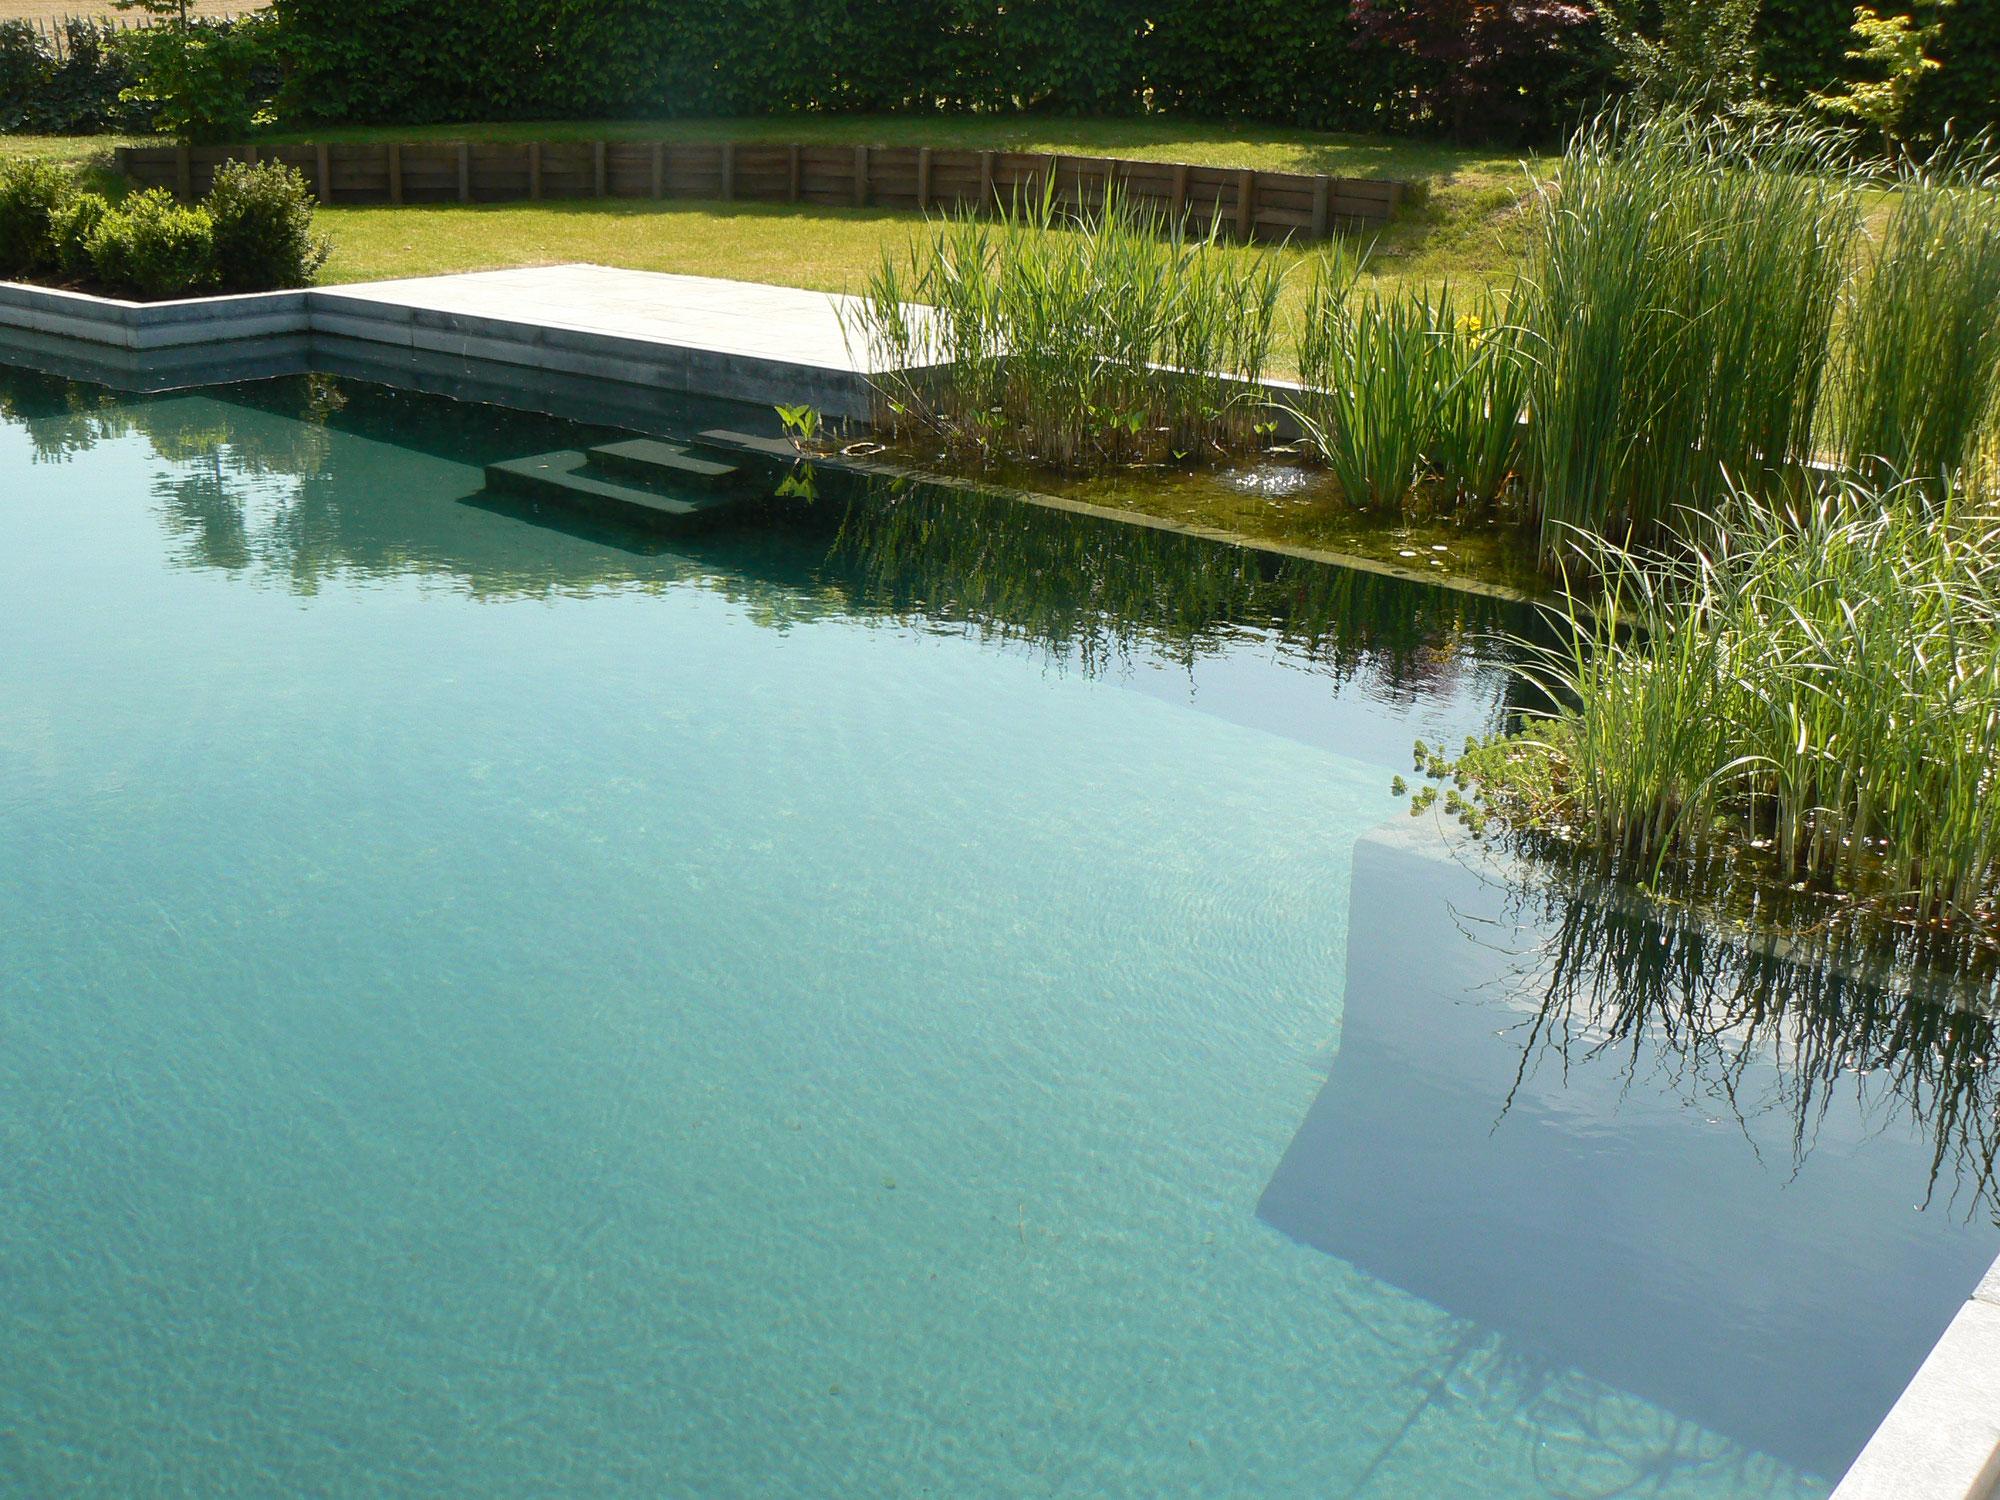 piscine naturelle plan d 39 eau et lagunage water garden. Black Bedroom Furniture Sets. Home Design Ideas